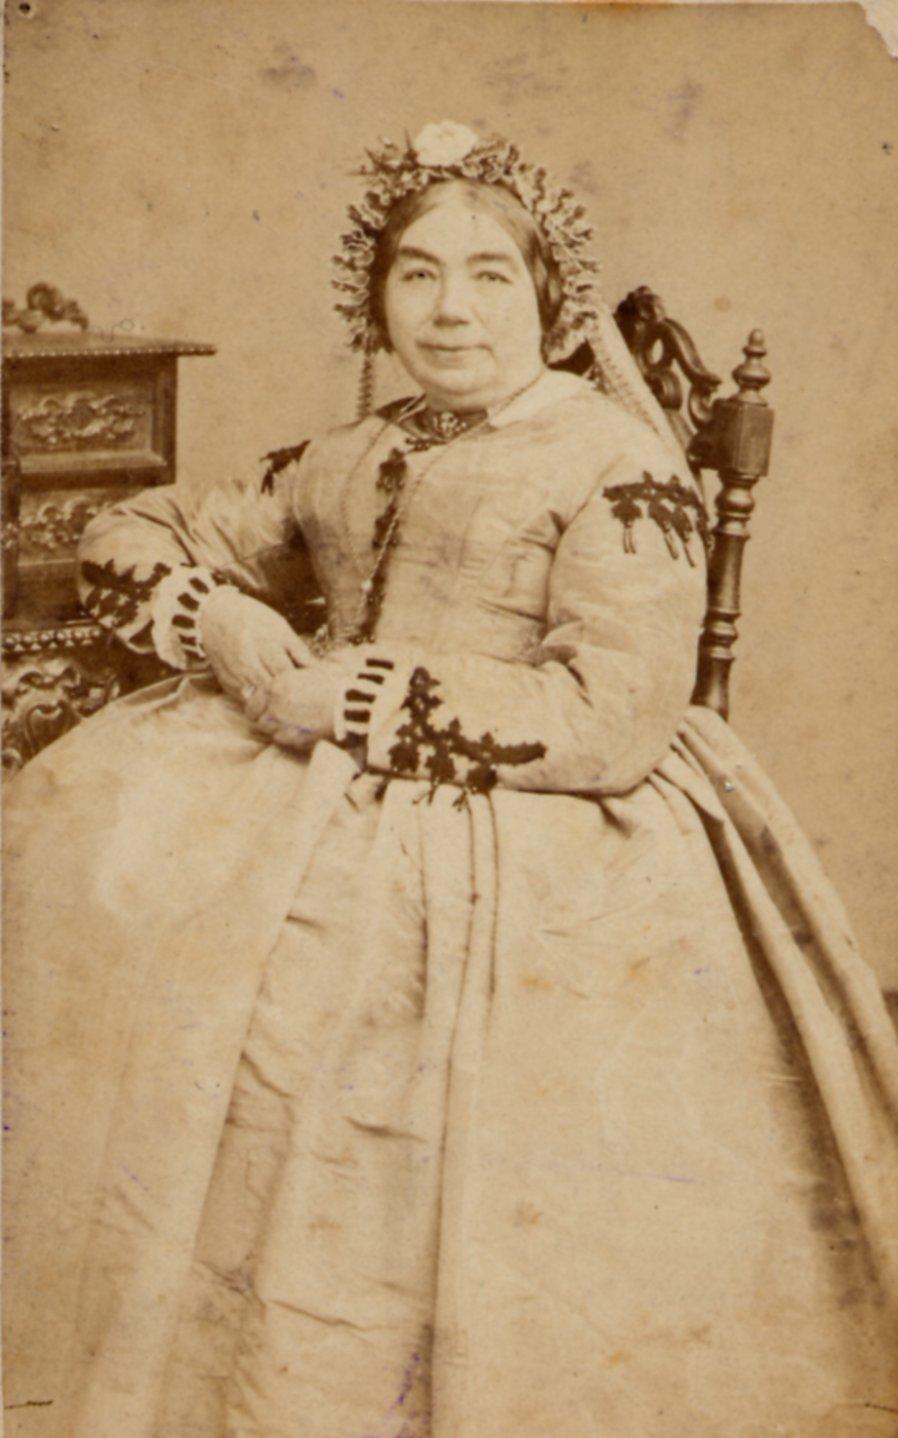 Anna-Maria Marres-Bemelmans